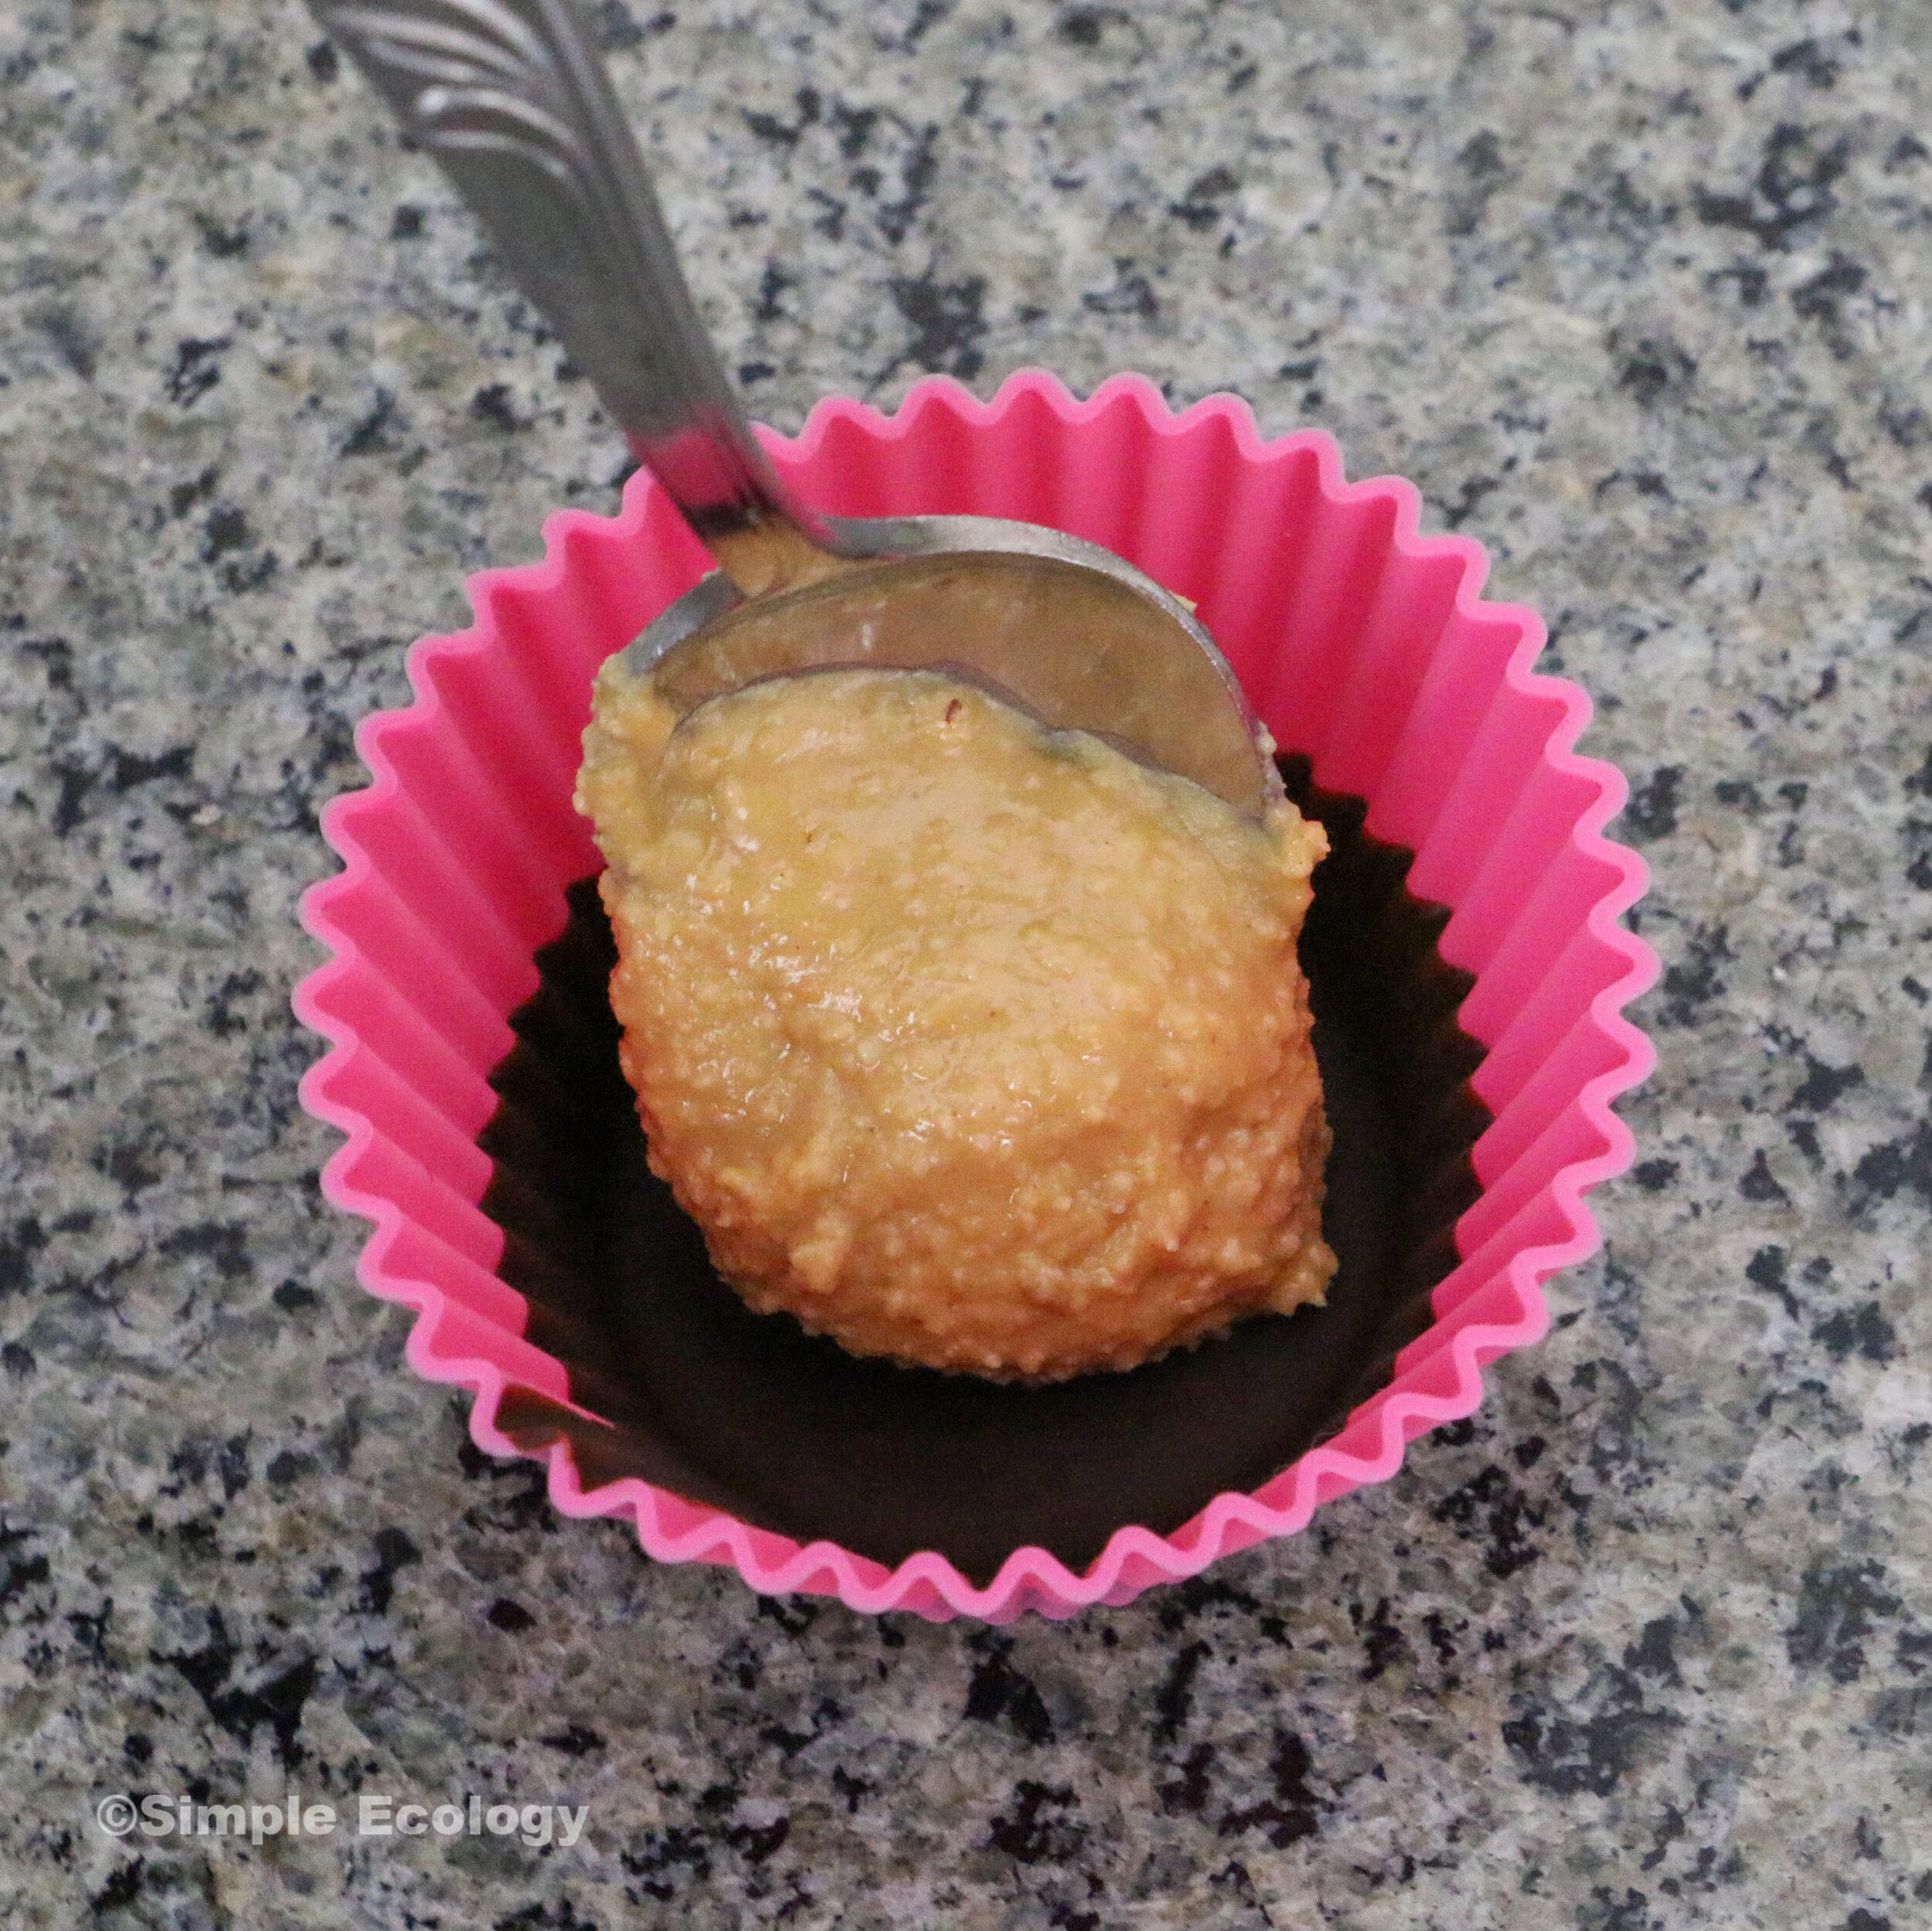 Cupcake PB cup spoon.jpg